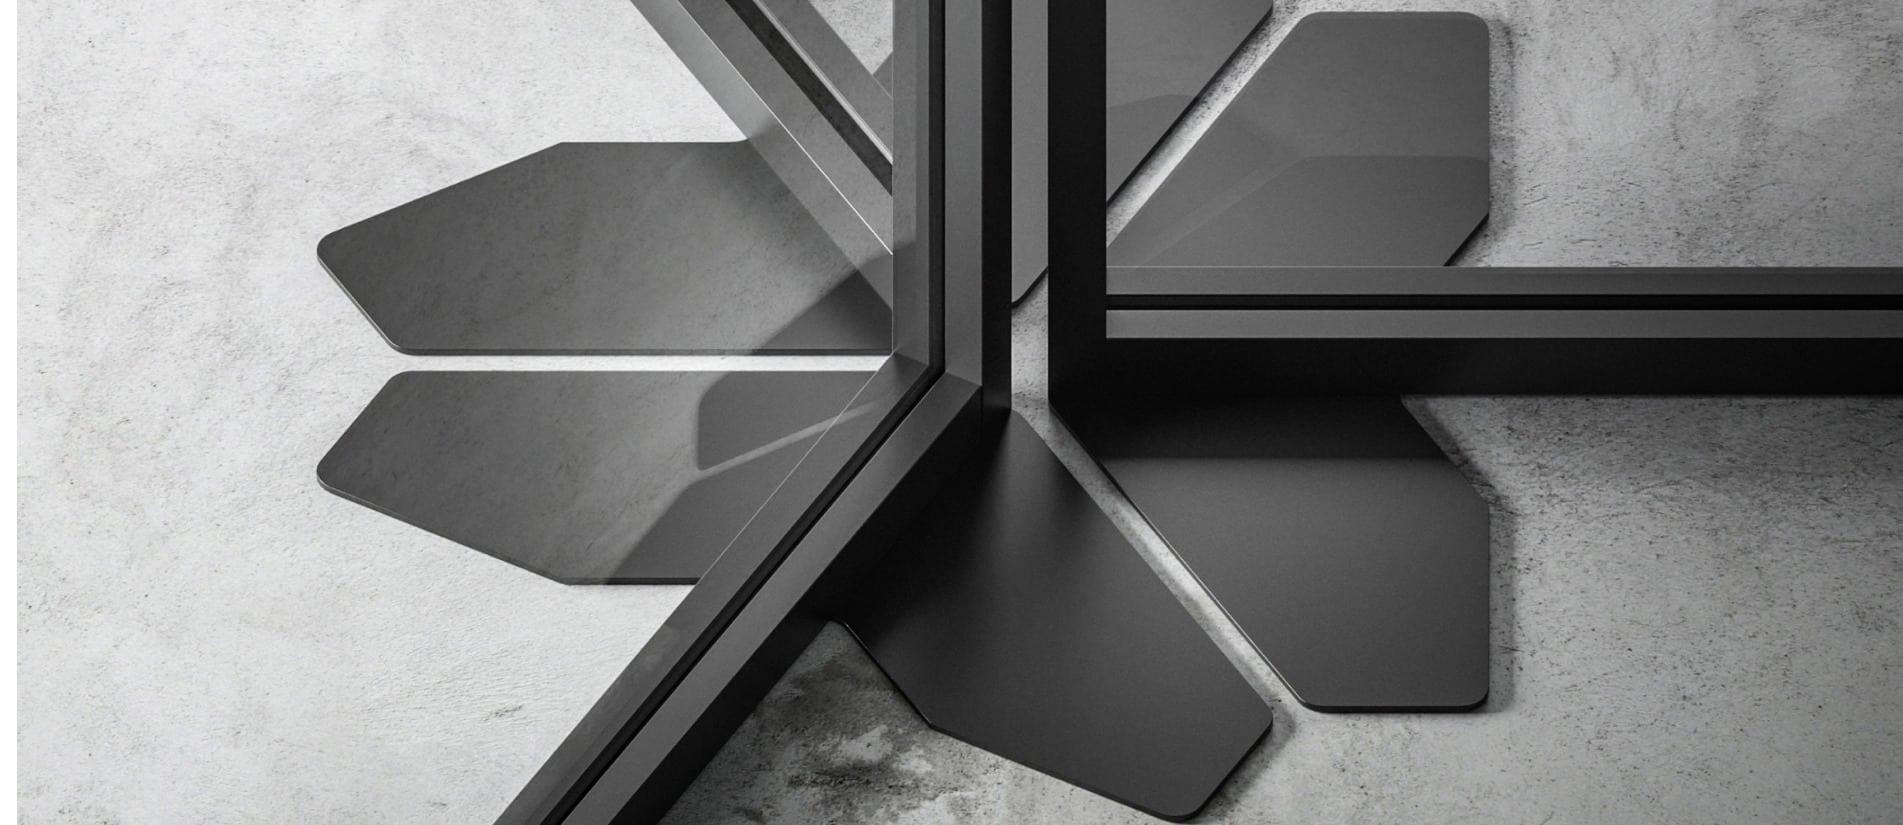 LUCID floor bracket in a powder coat finish by Transwall